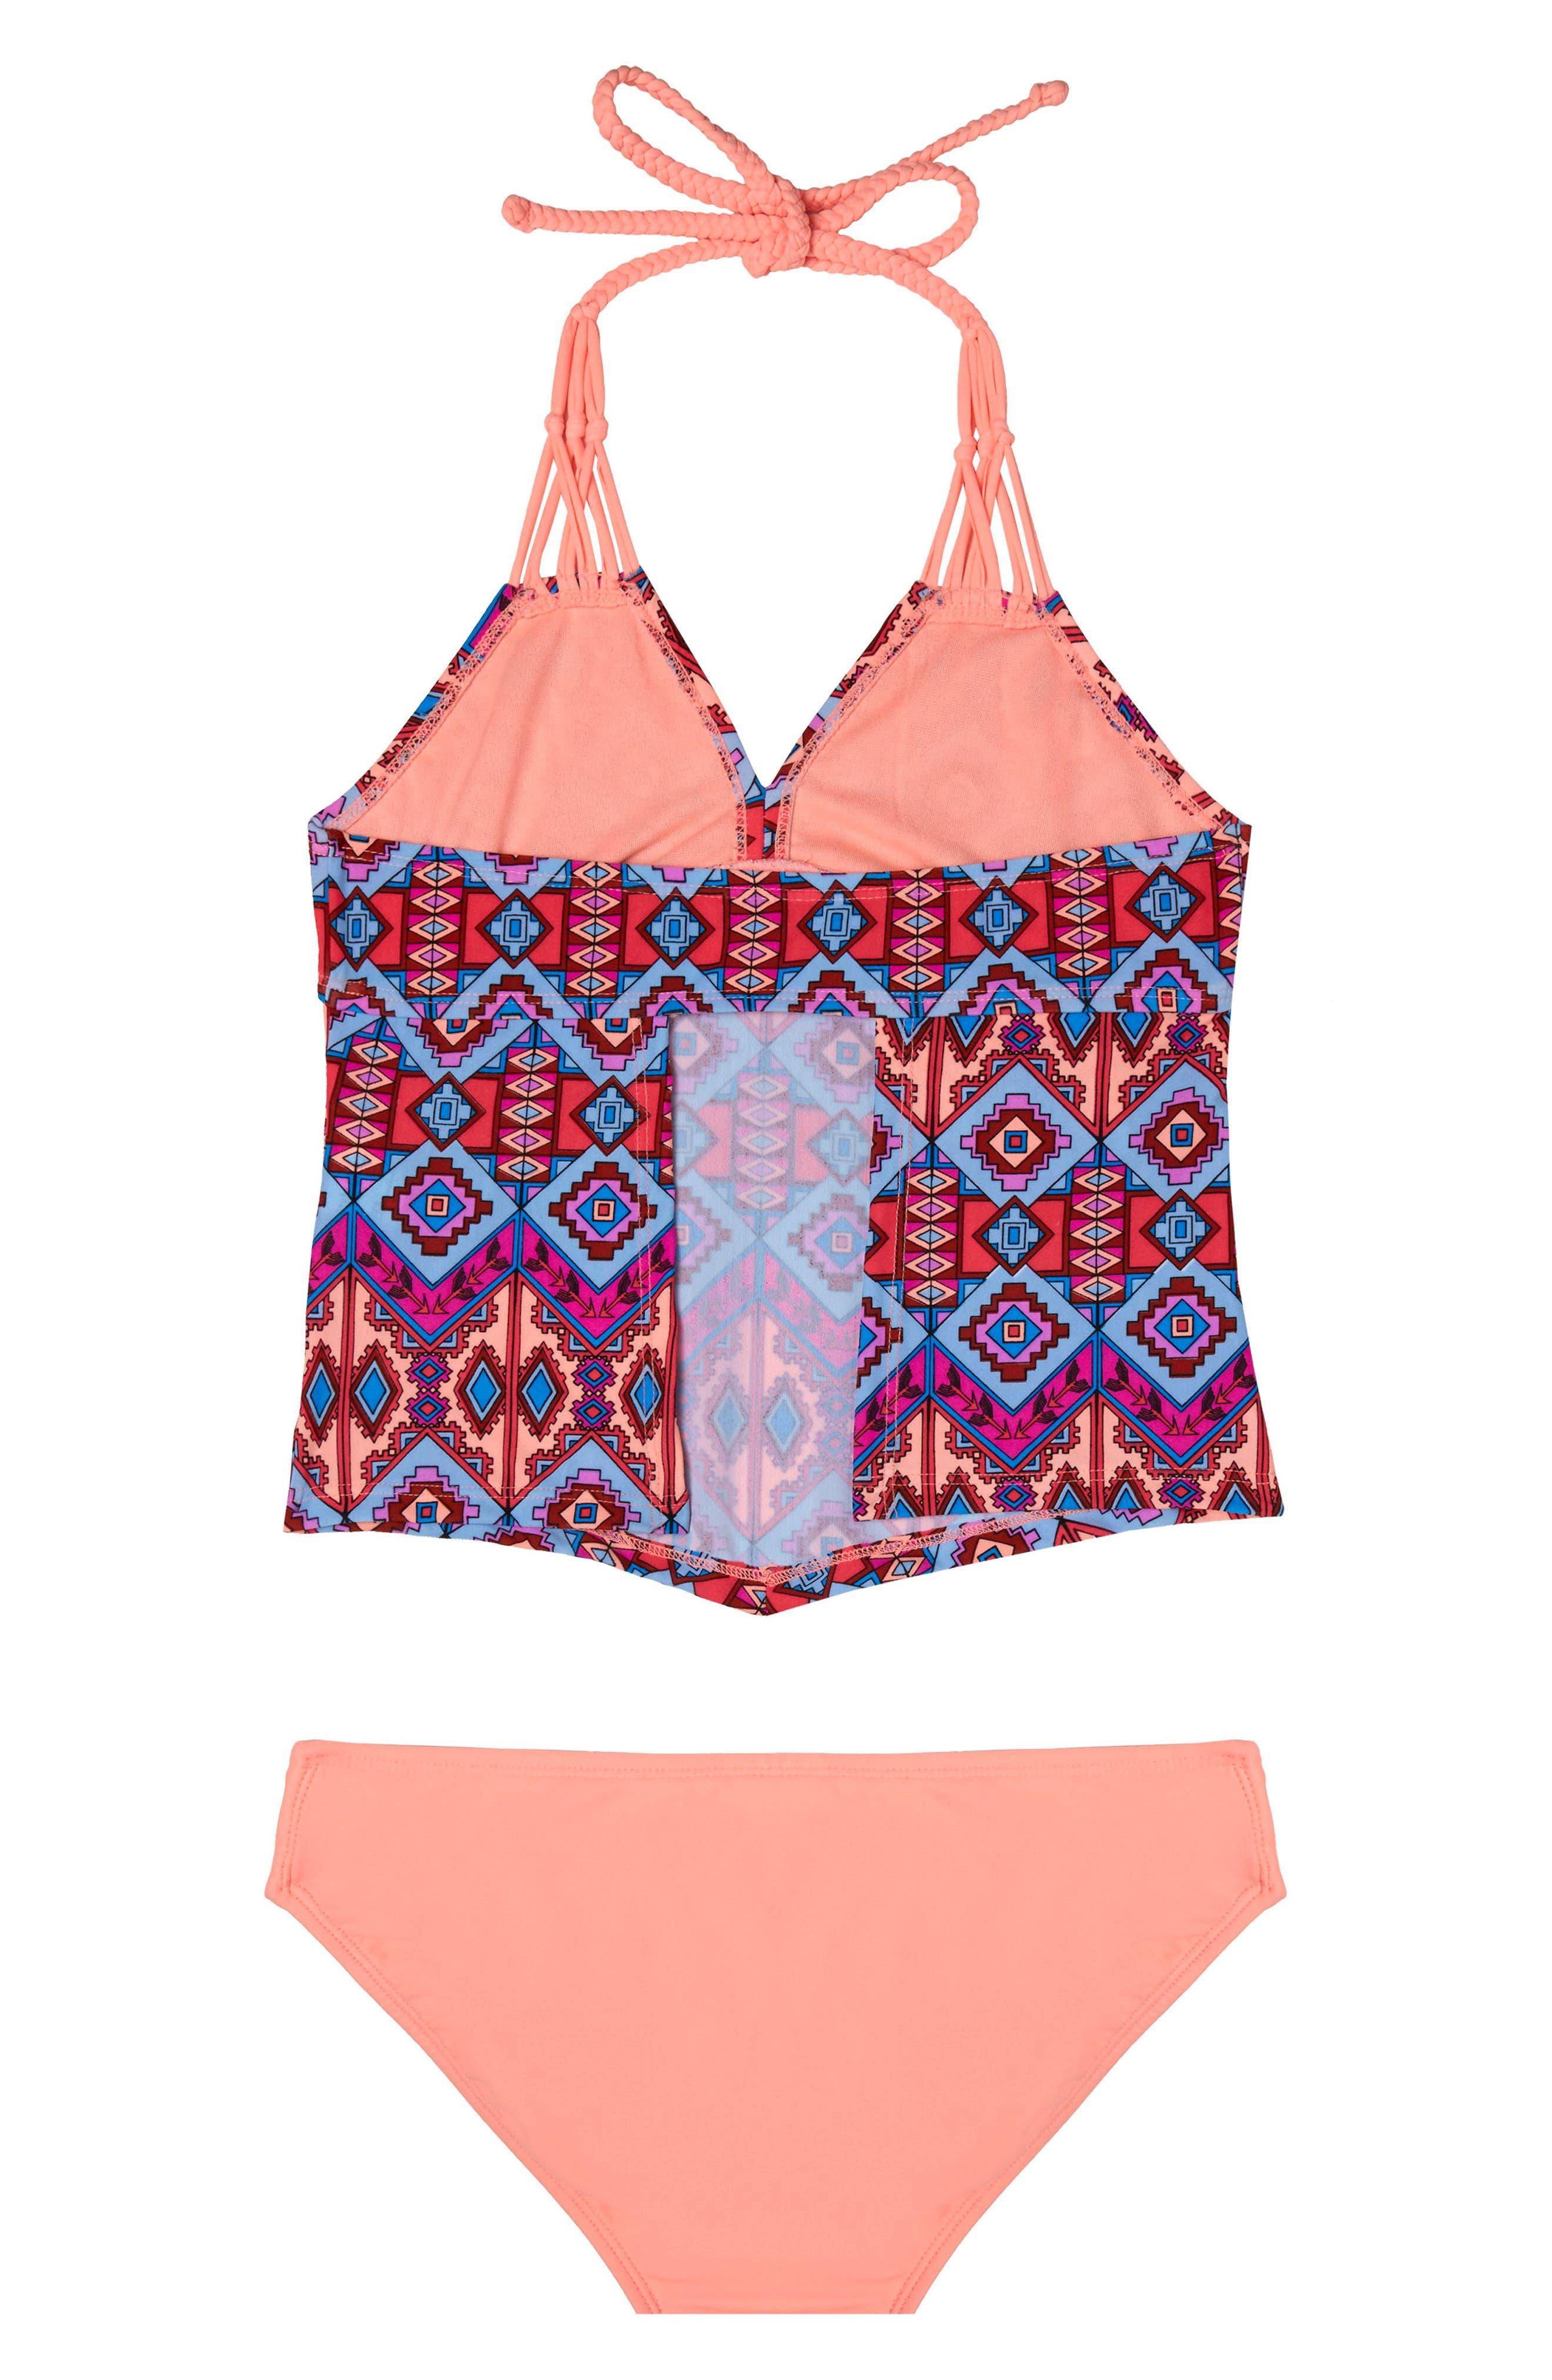 Brave Spirit Two-Piece Swimsuit,                             Alternate thumbnail 2, color,                             Coral